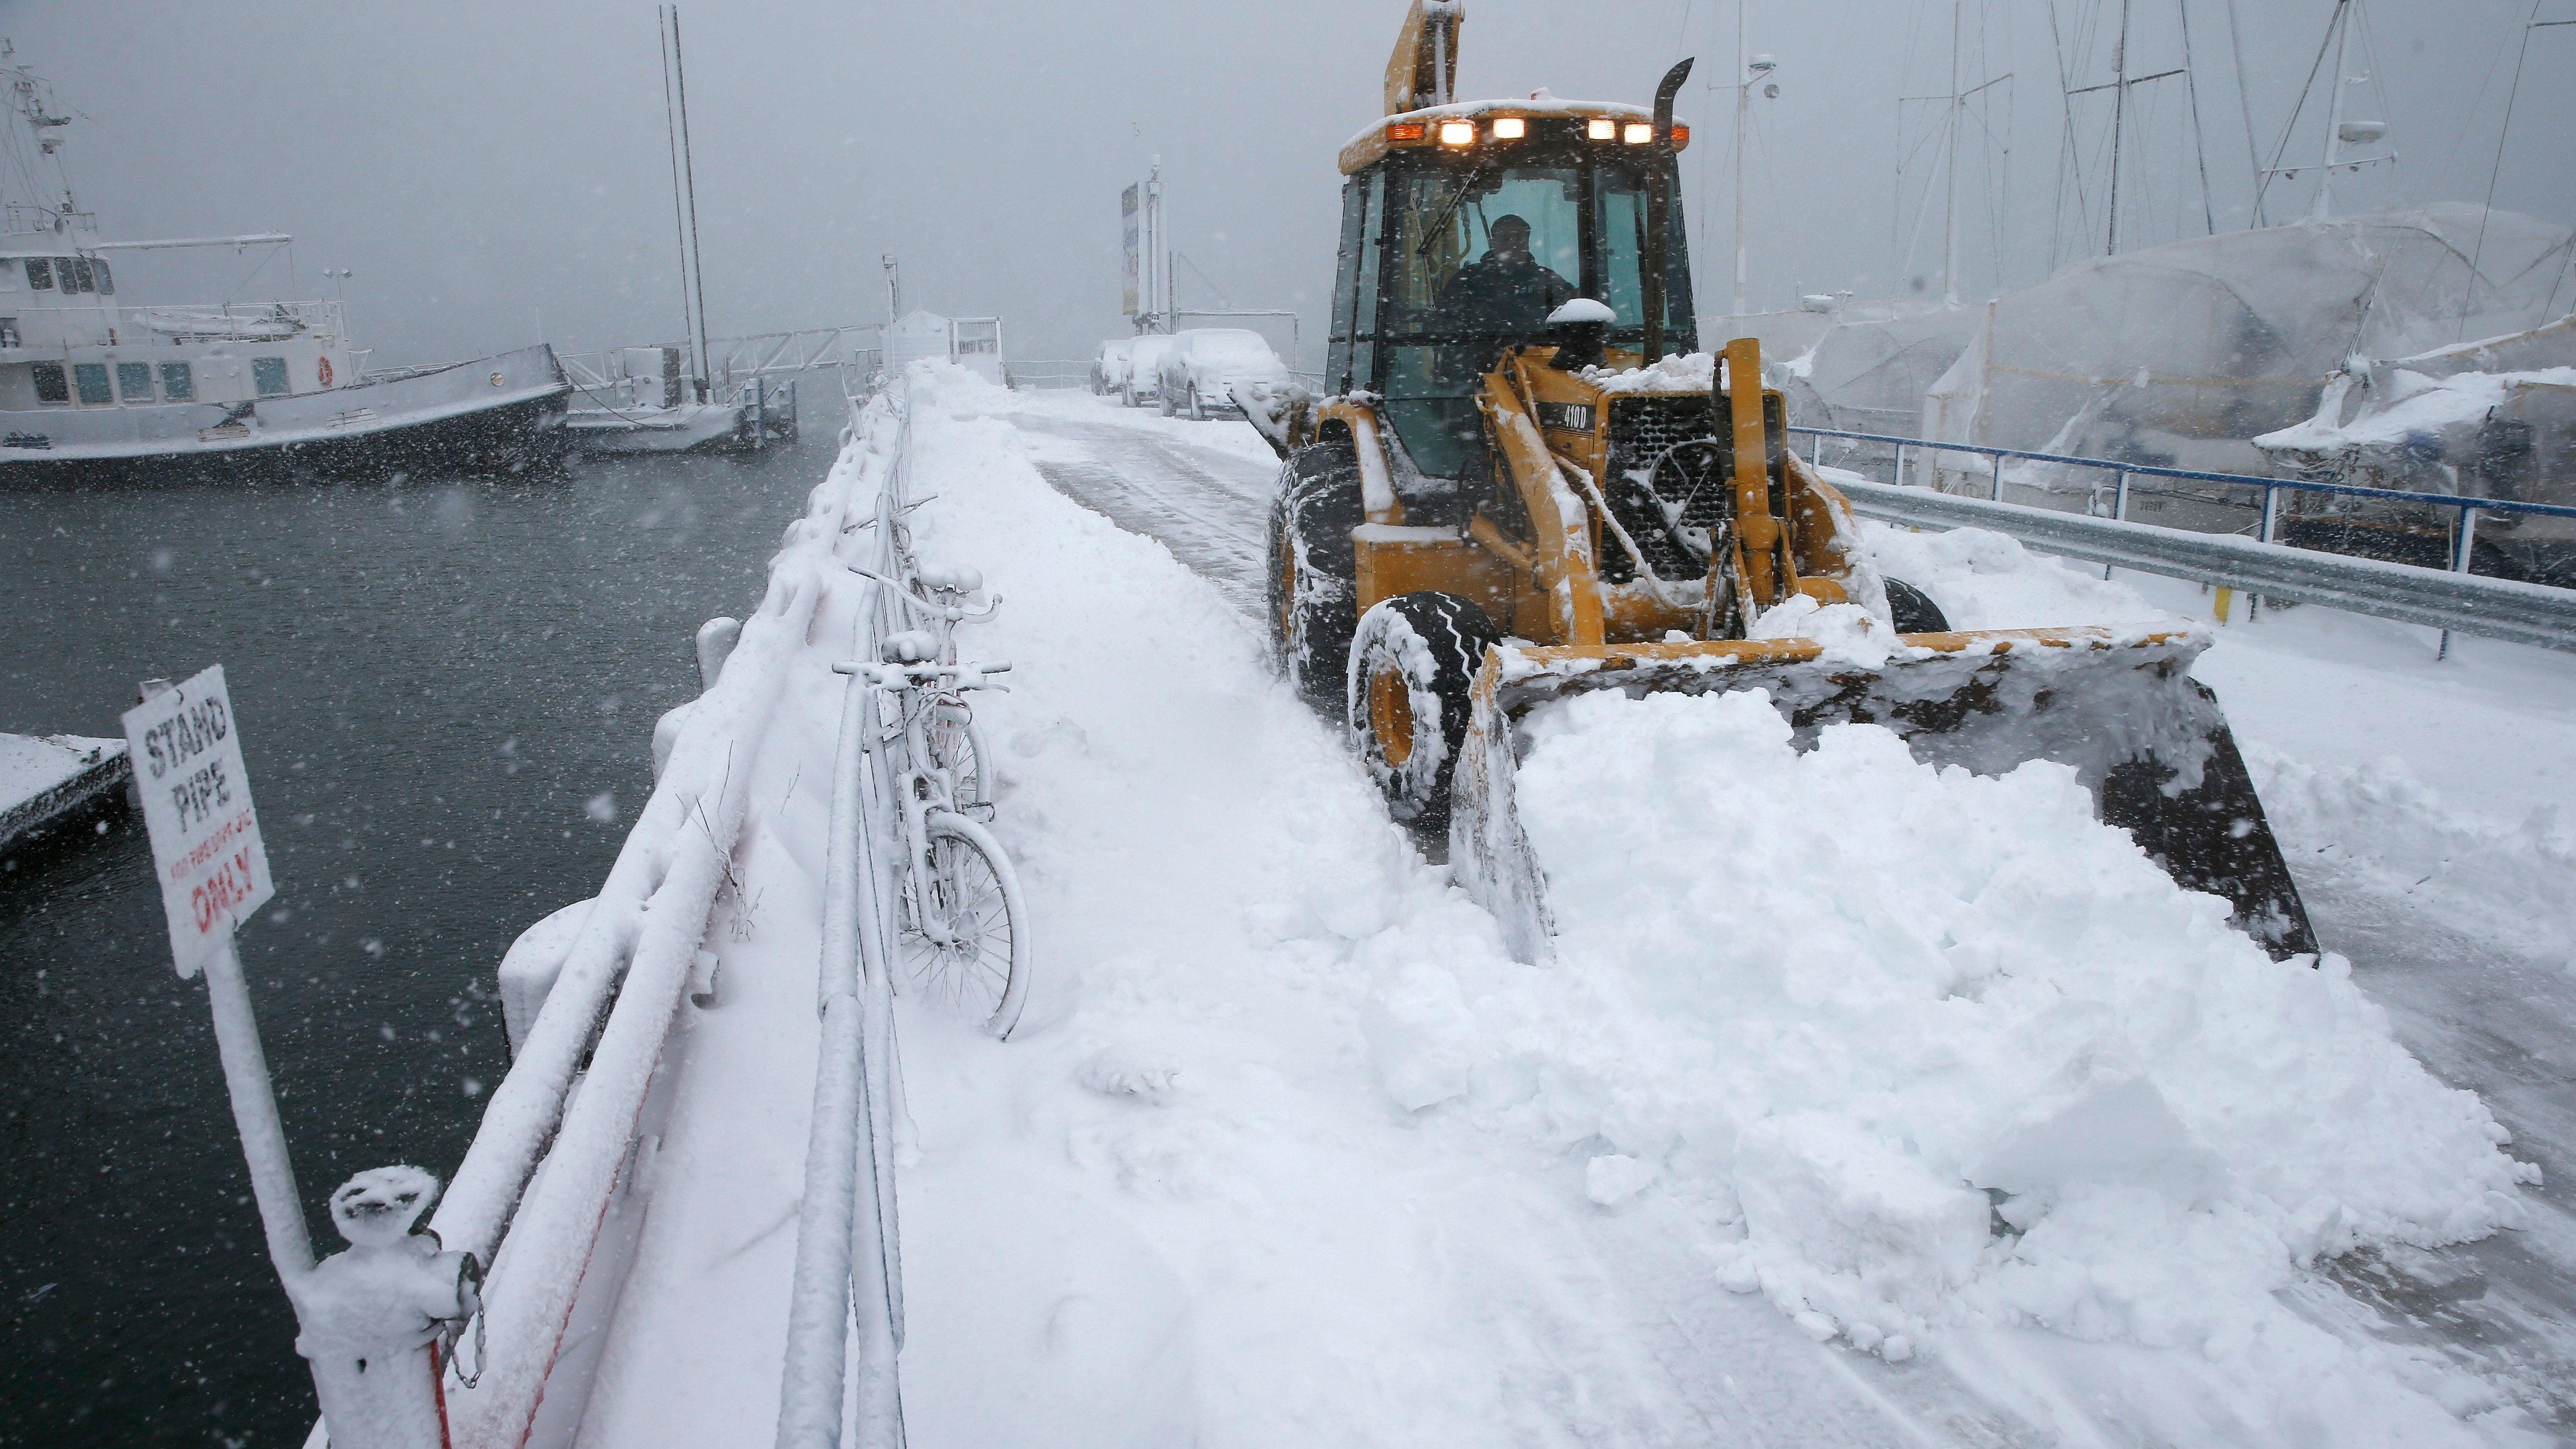 Bummer: Global Warming Won't Make Giant Winter Snow Storms Go Away